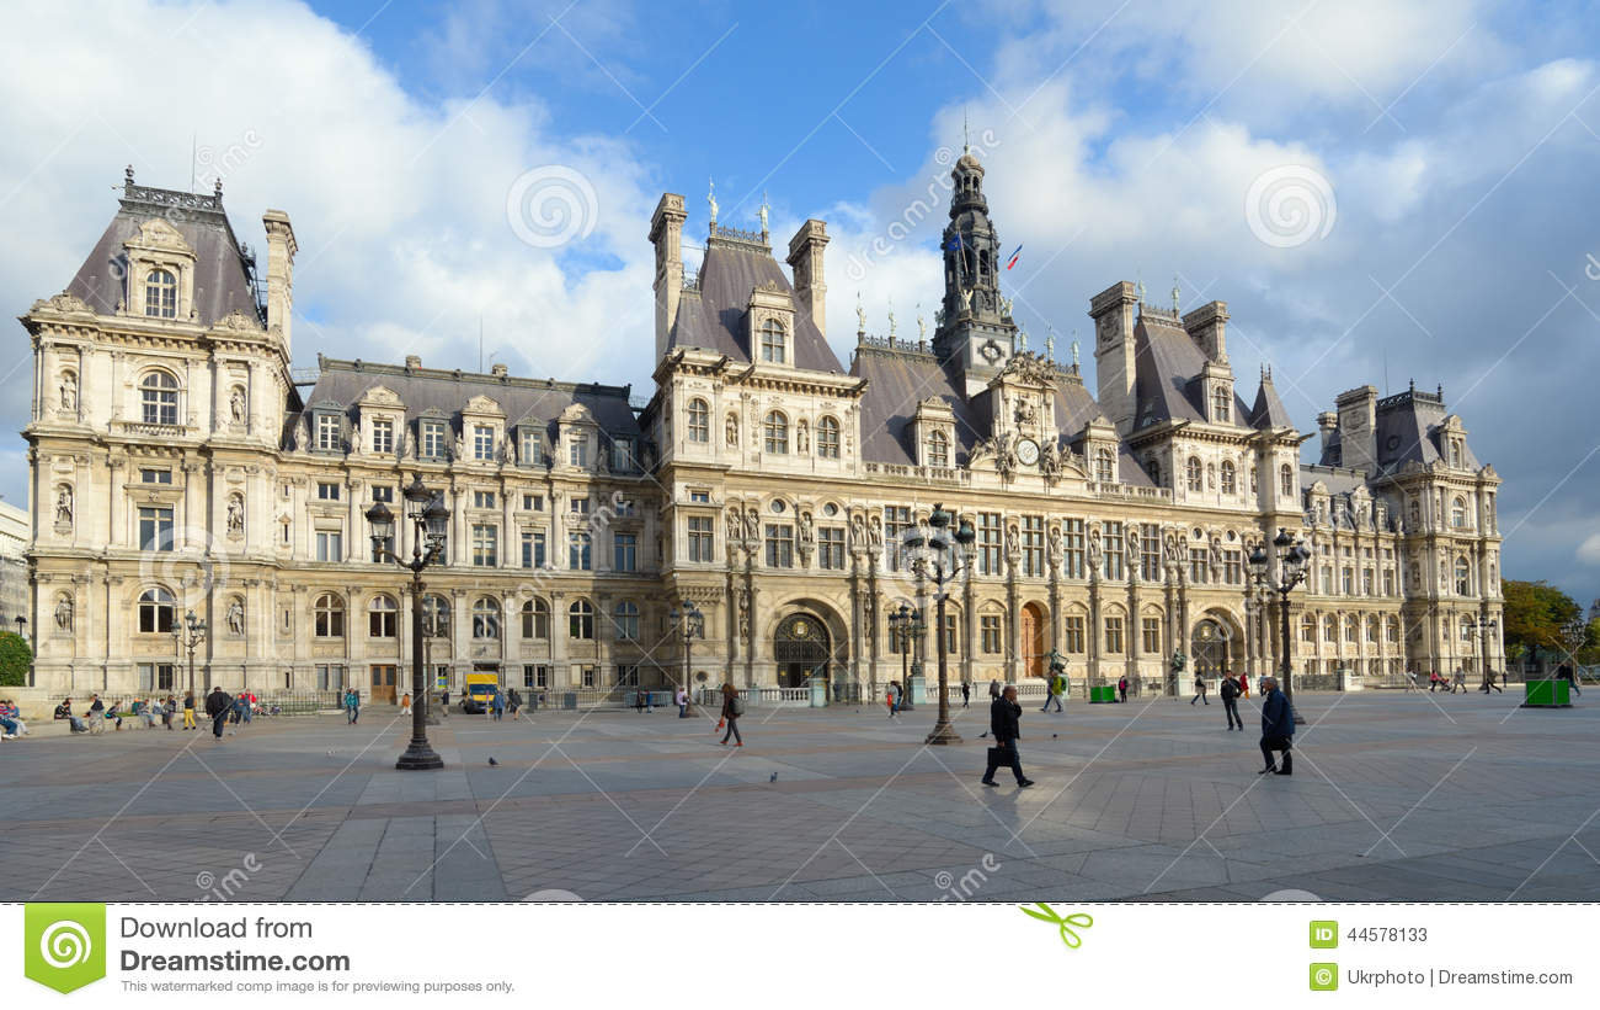 Hotel De Ville In Paris Editorial Stock Photo Image